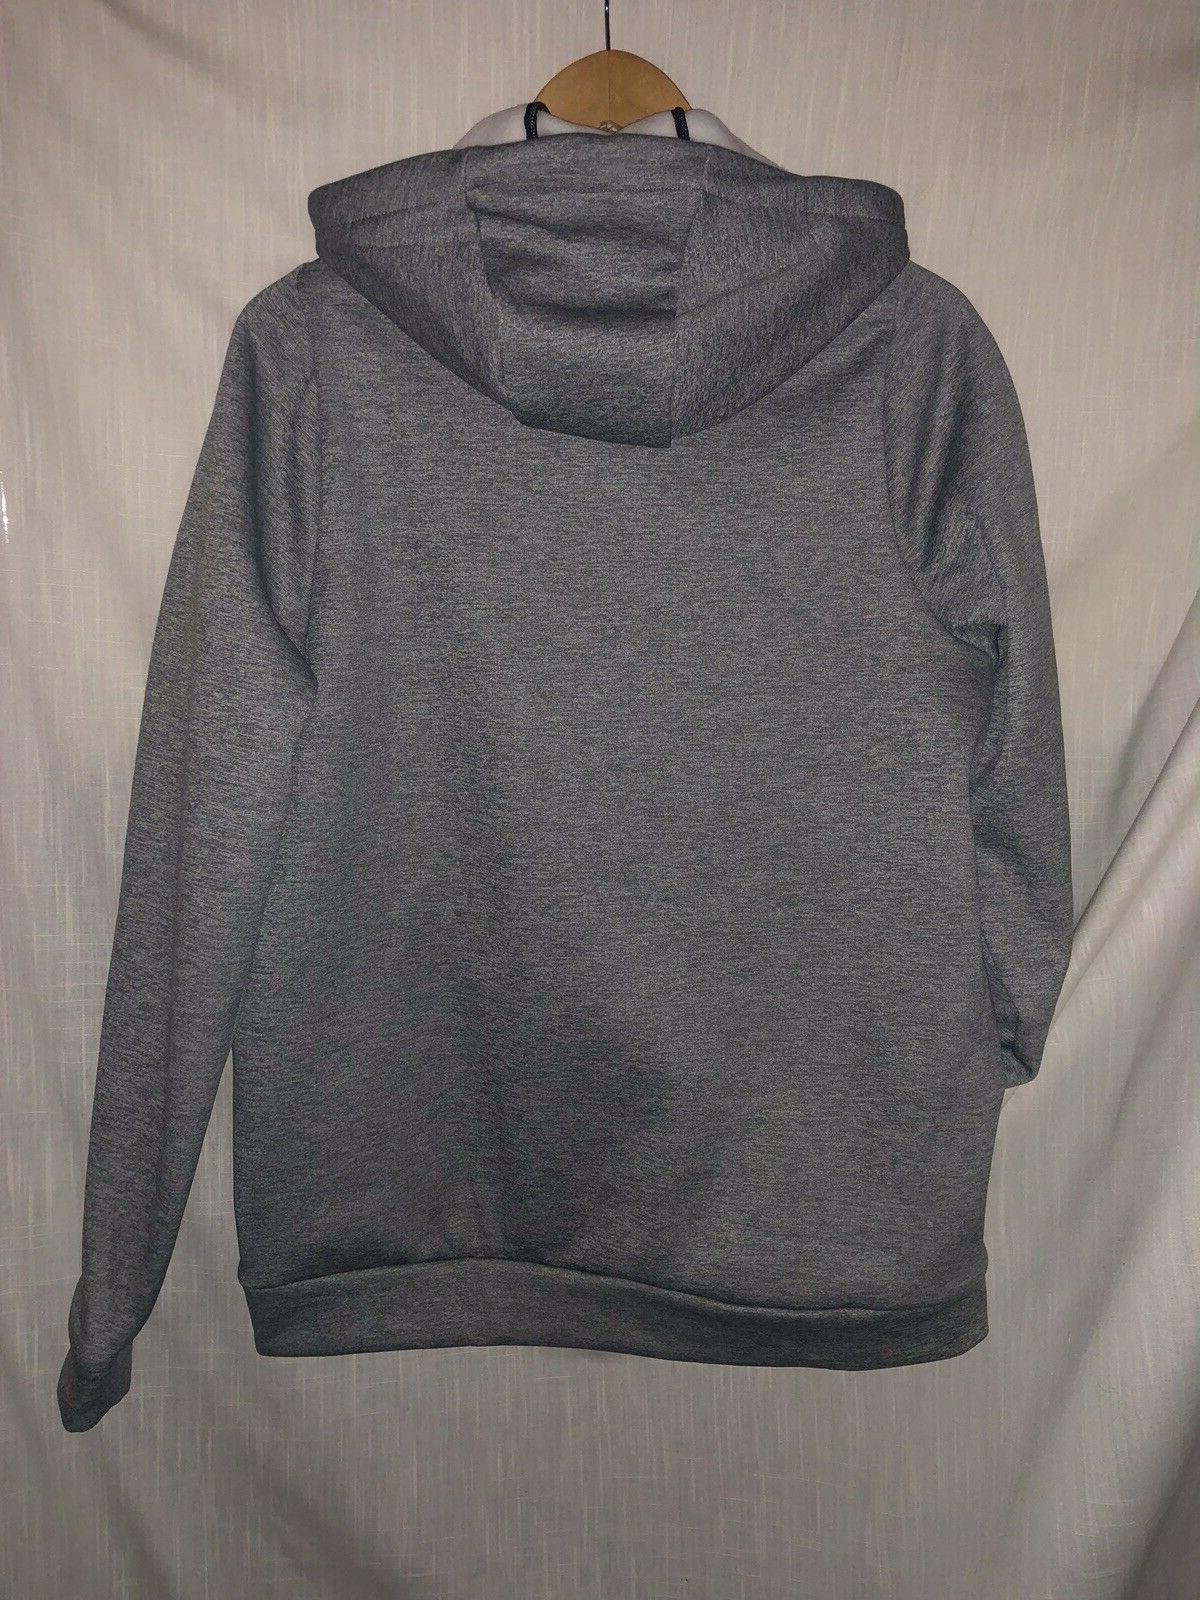 Nike Therma Suit Sz Medium